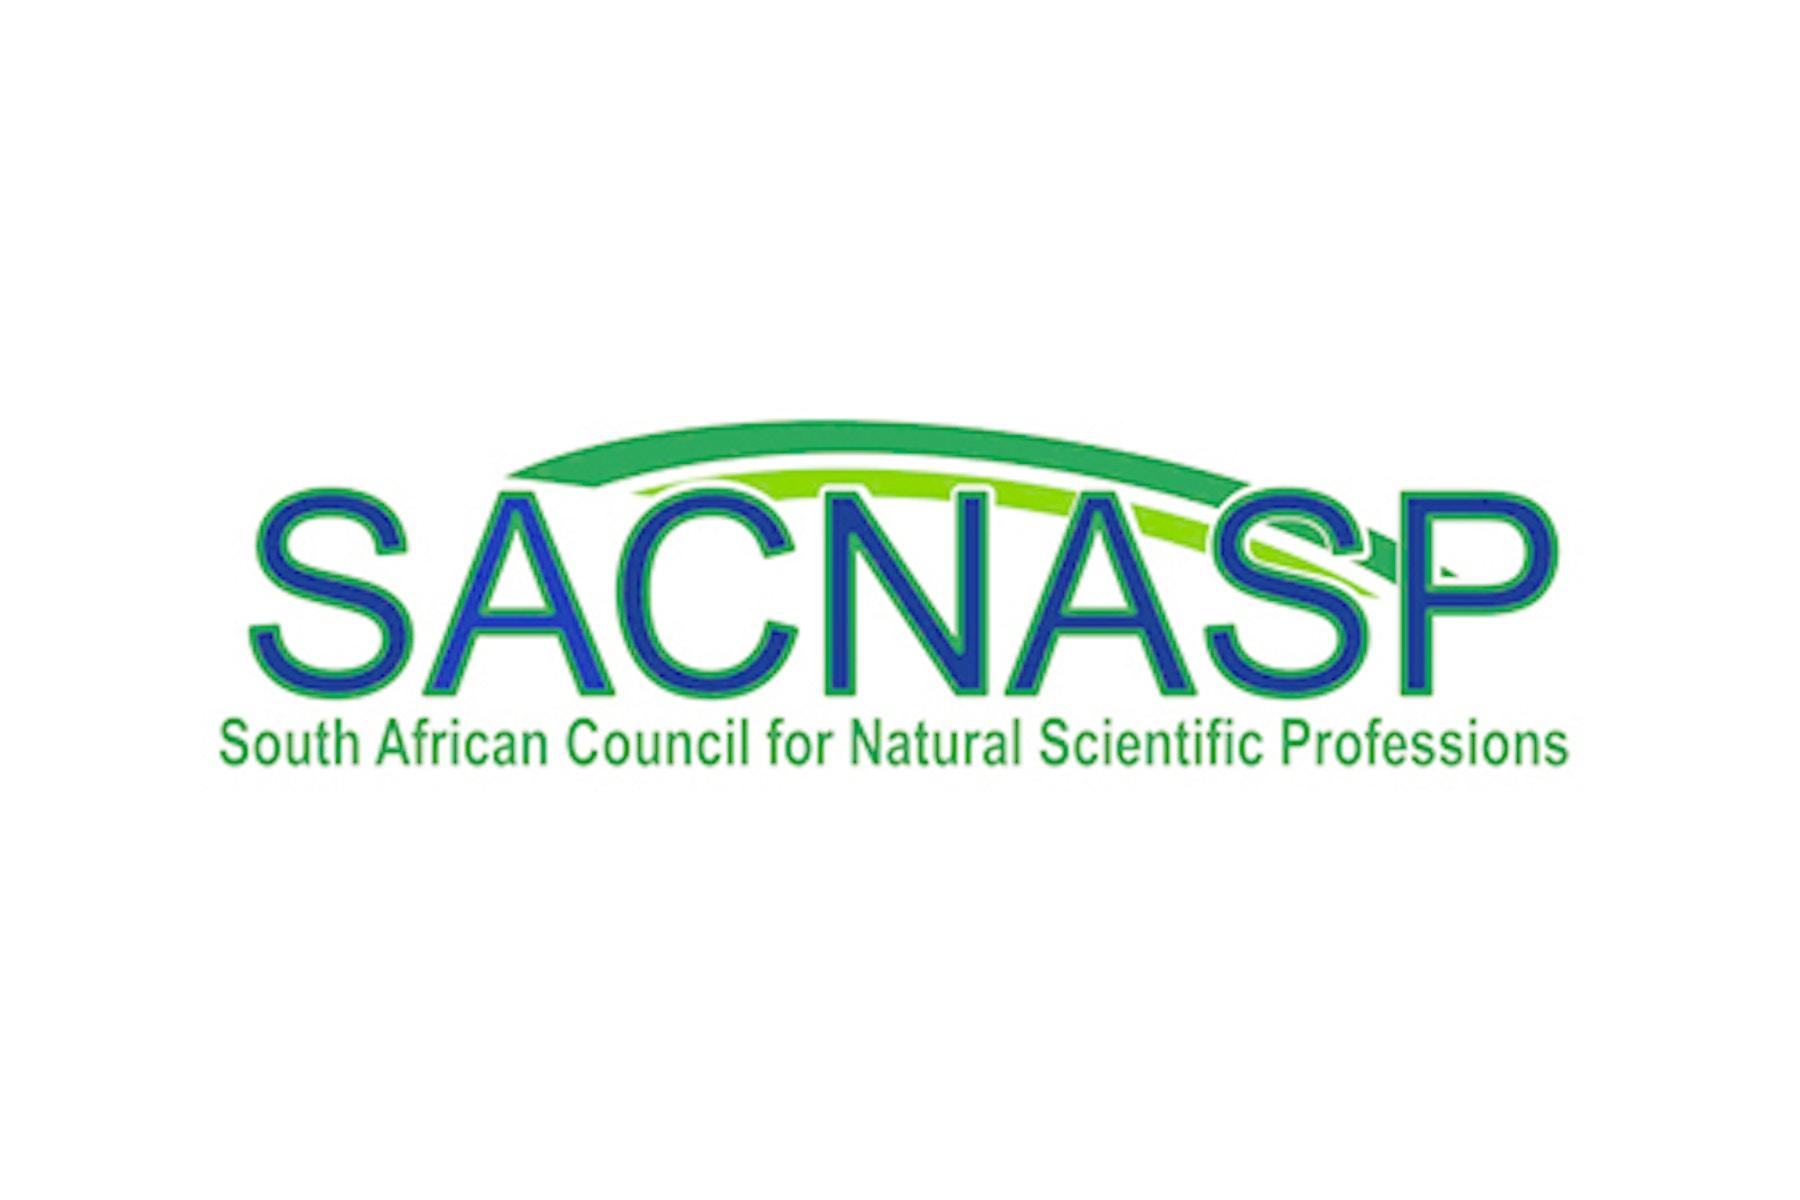 Sacnasp-fallback